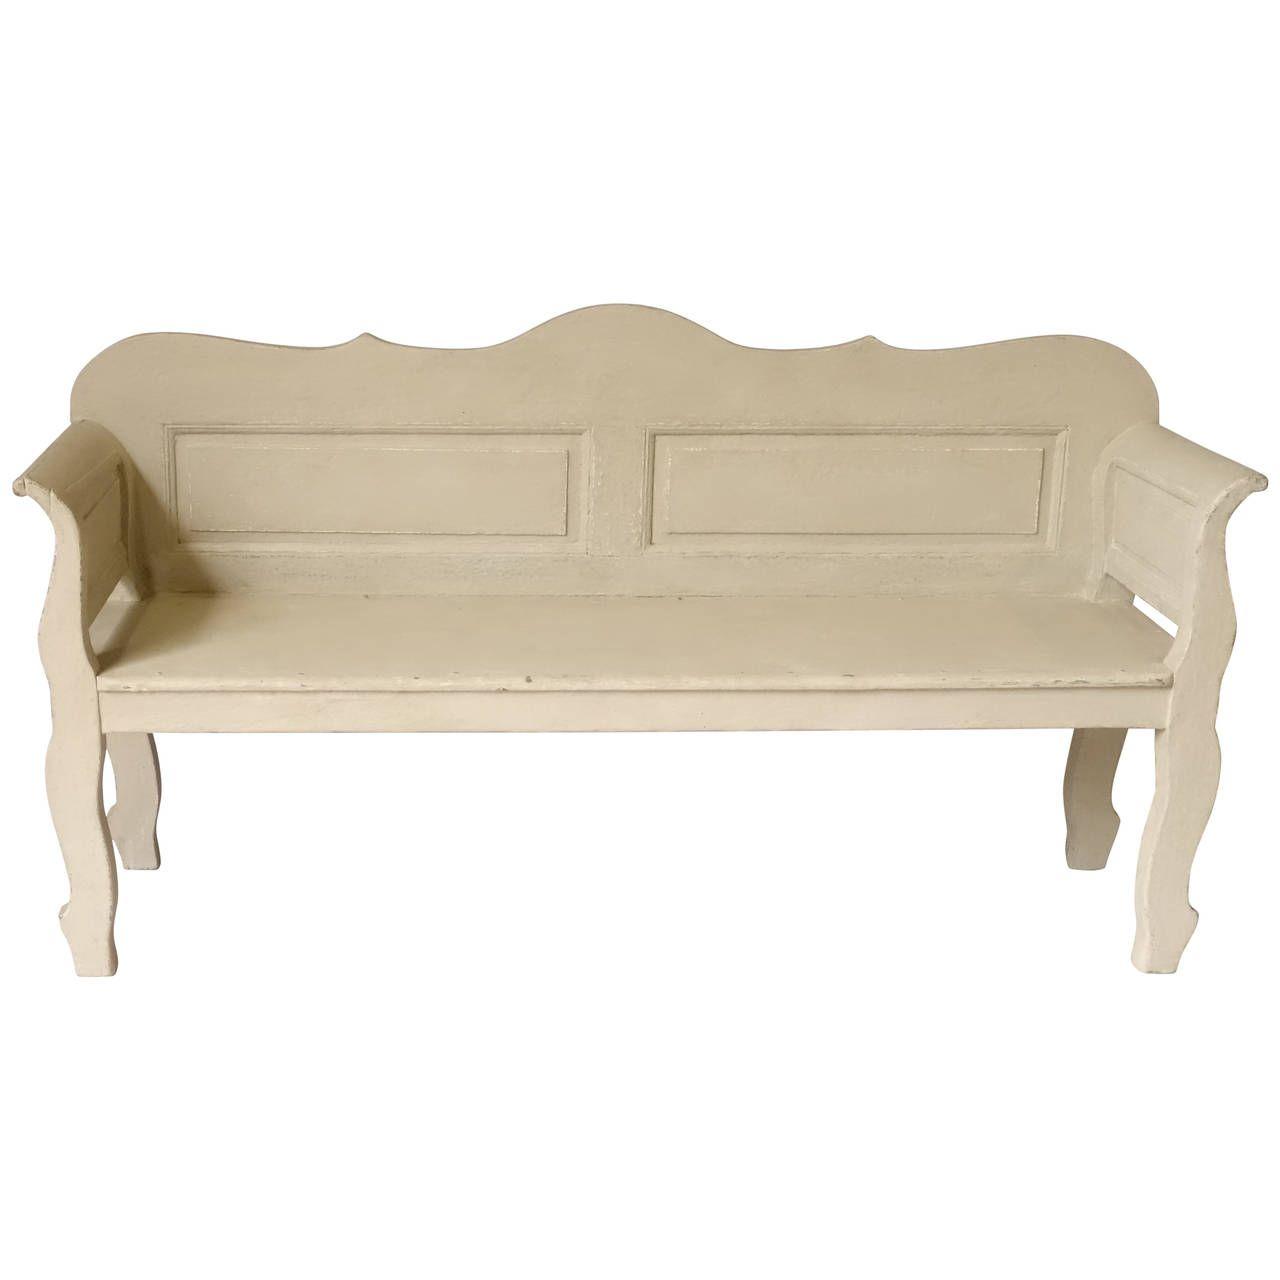 Pin By Gail Azeredo Woods On Kitchens Scandinavian Benches Scandinavian Furniture Vintage Bench